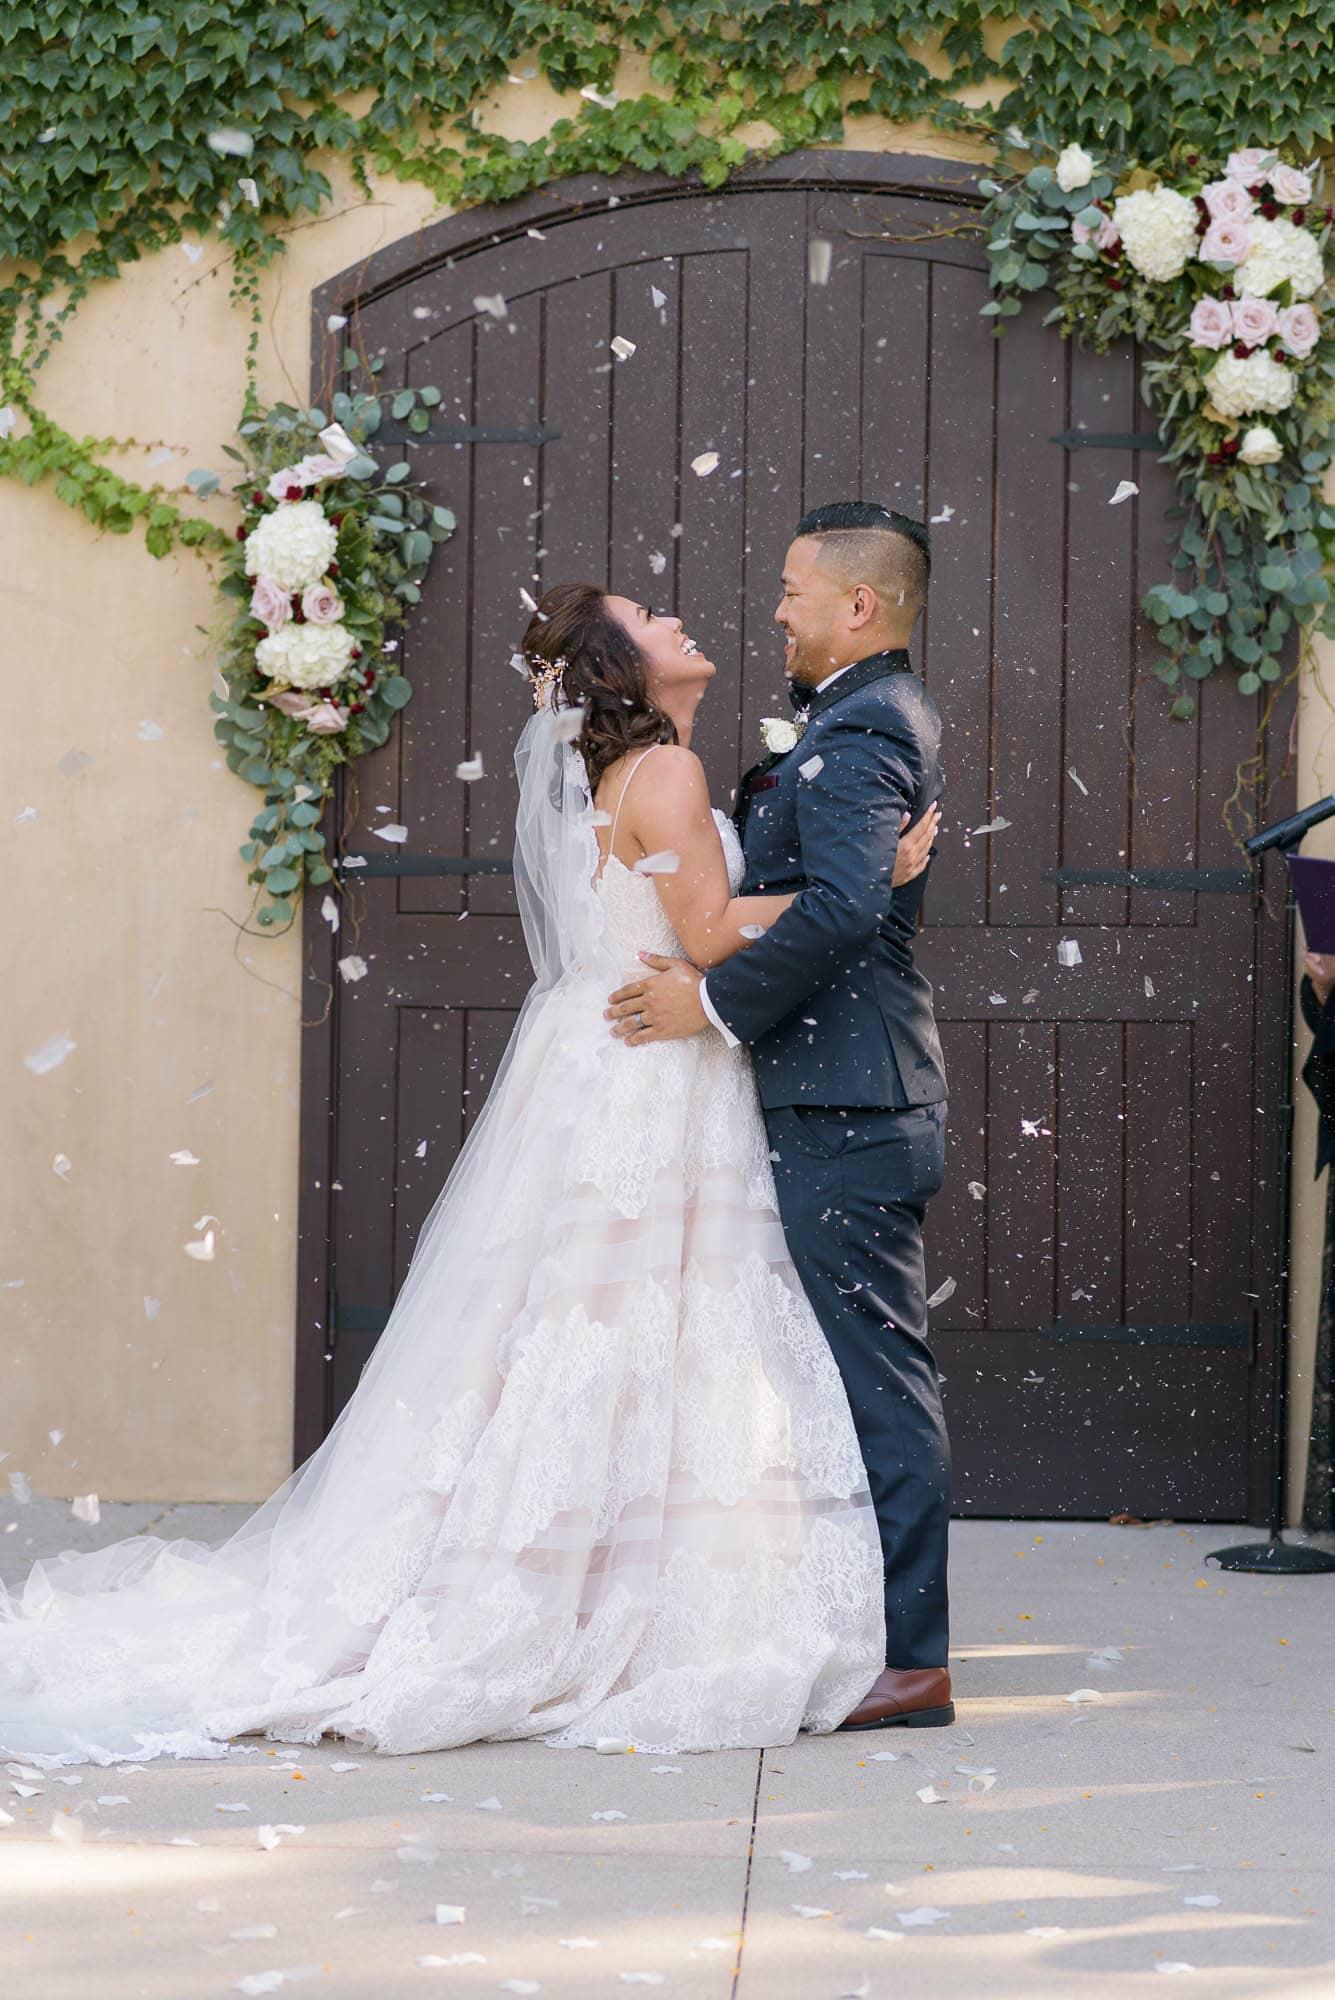 024_Alan_and_Heidi_Wedding_Karla_Paolo